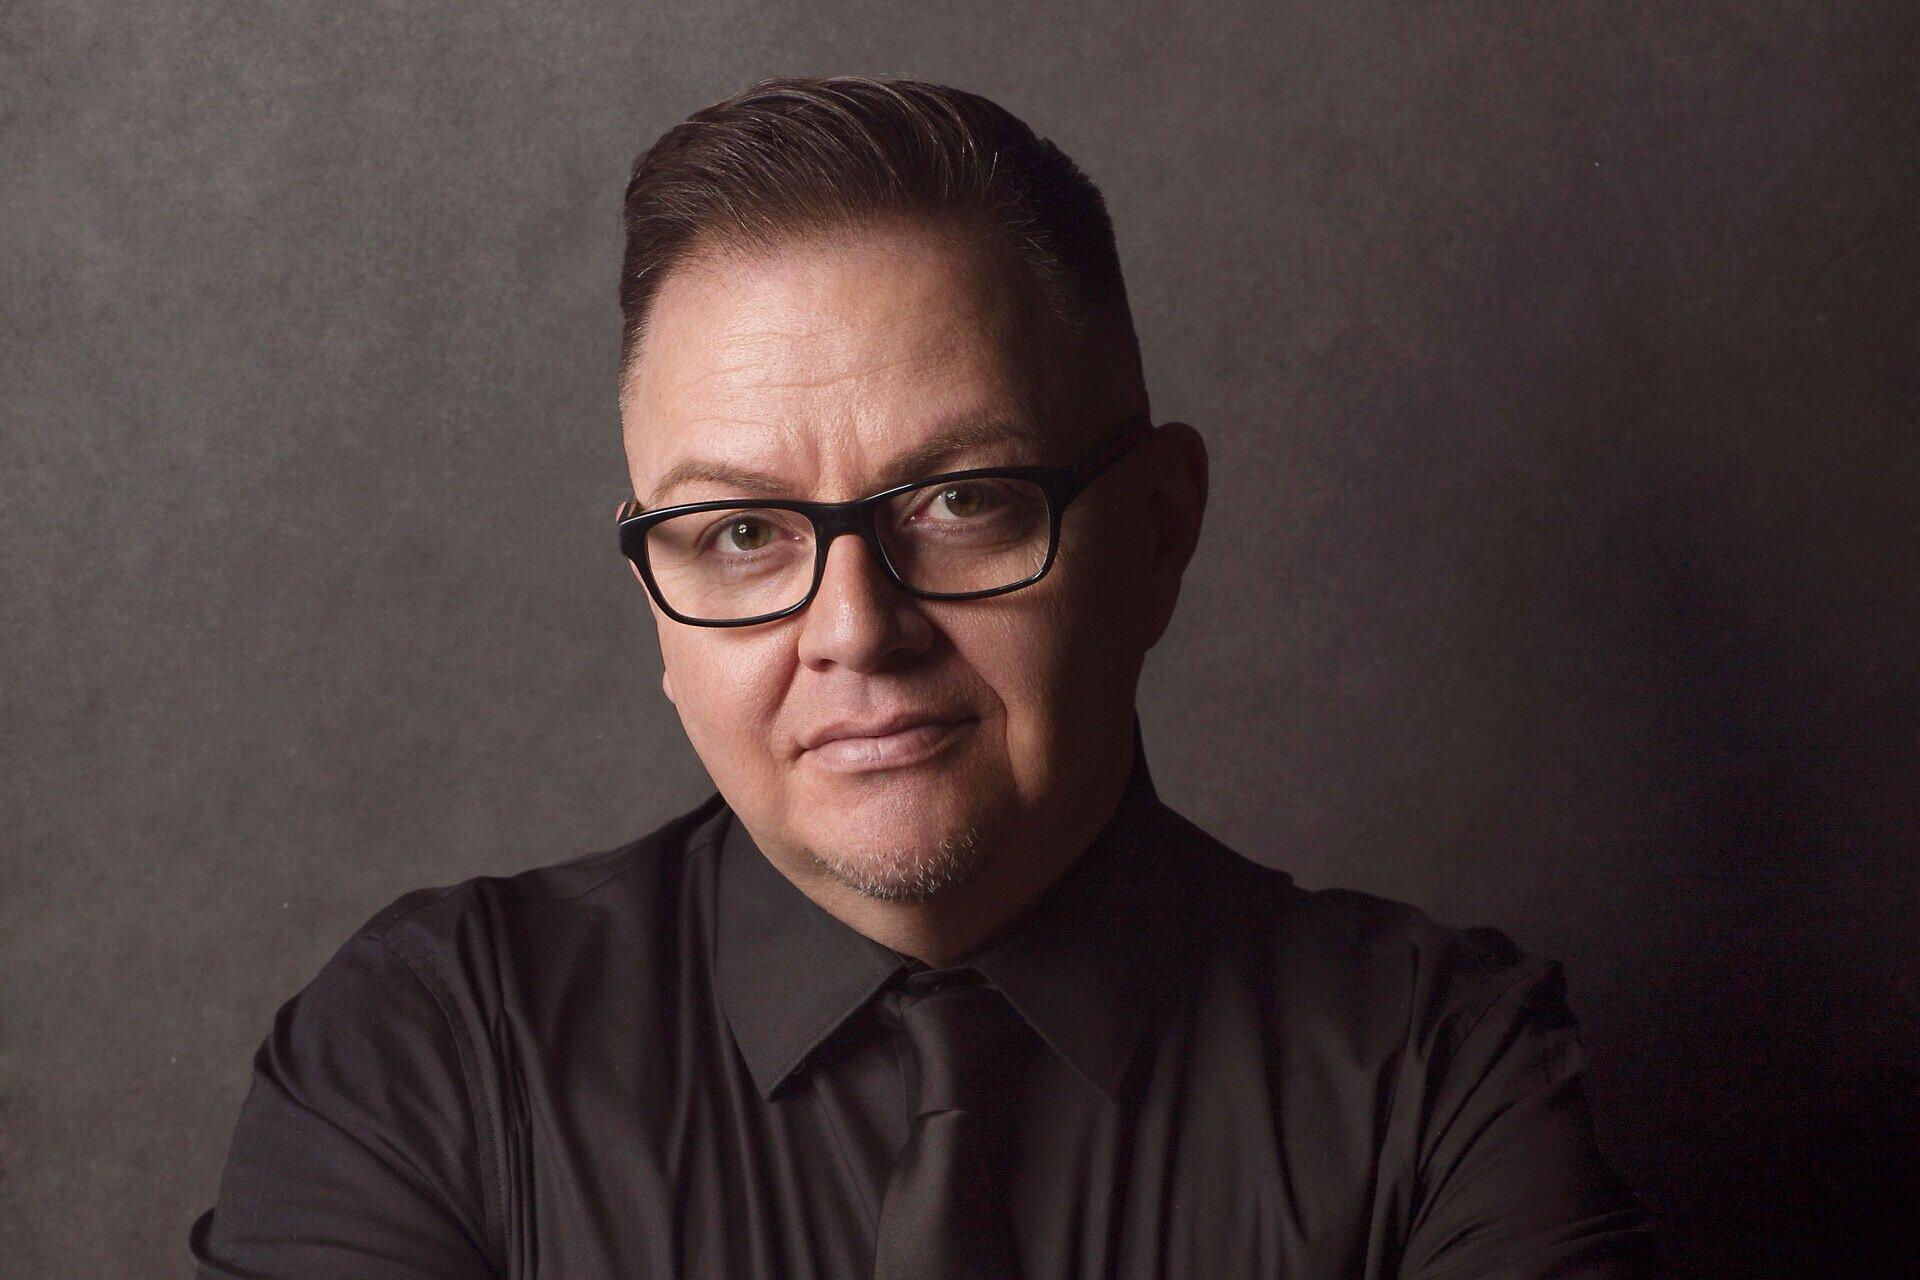 Franco Hernandez, Hair Professional